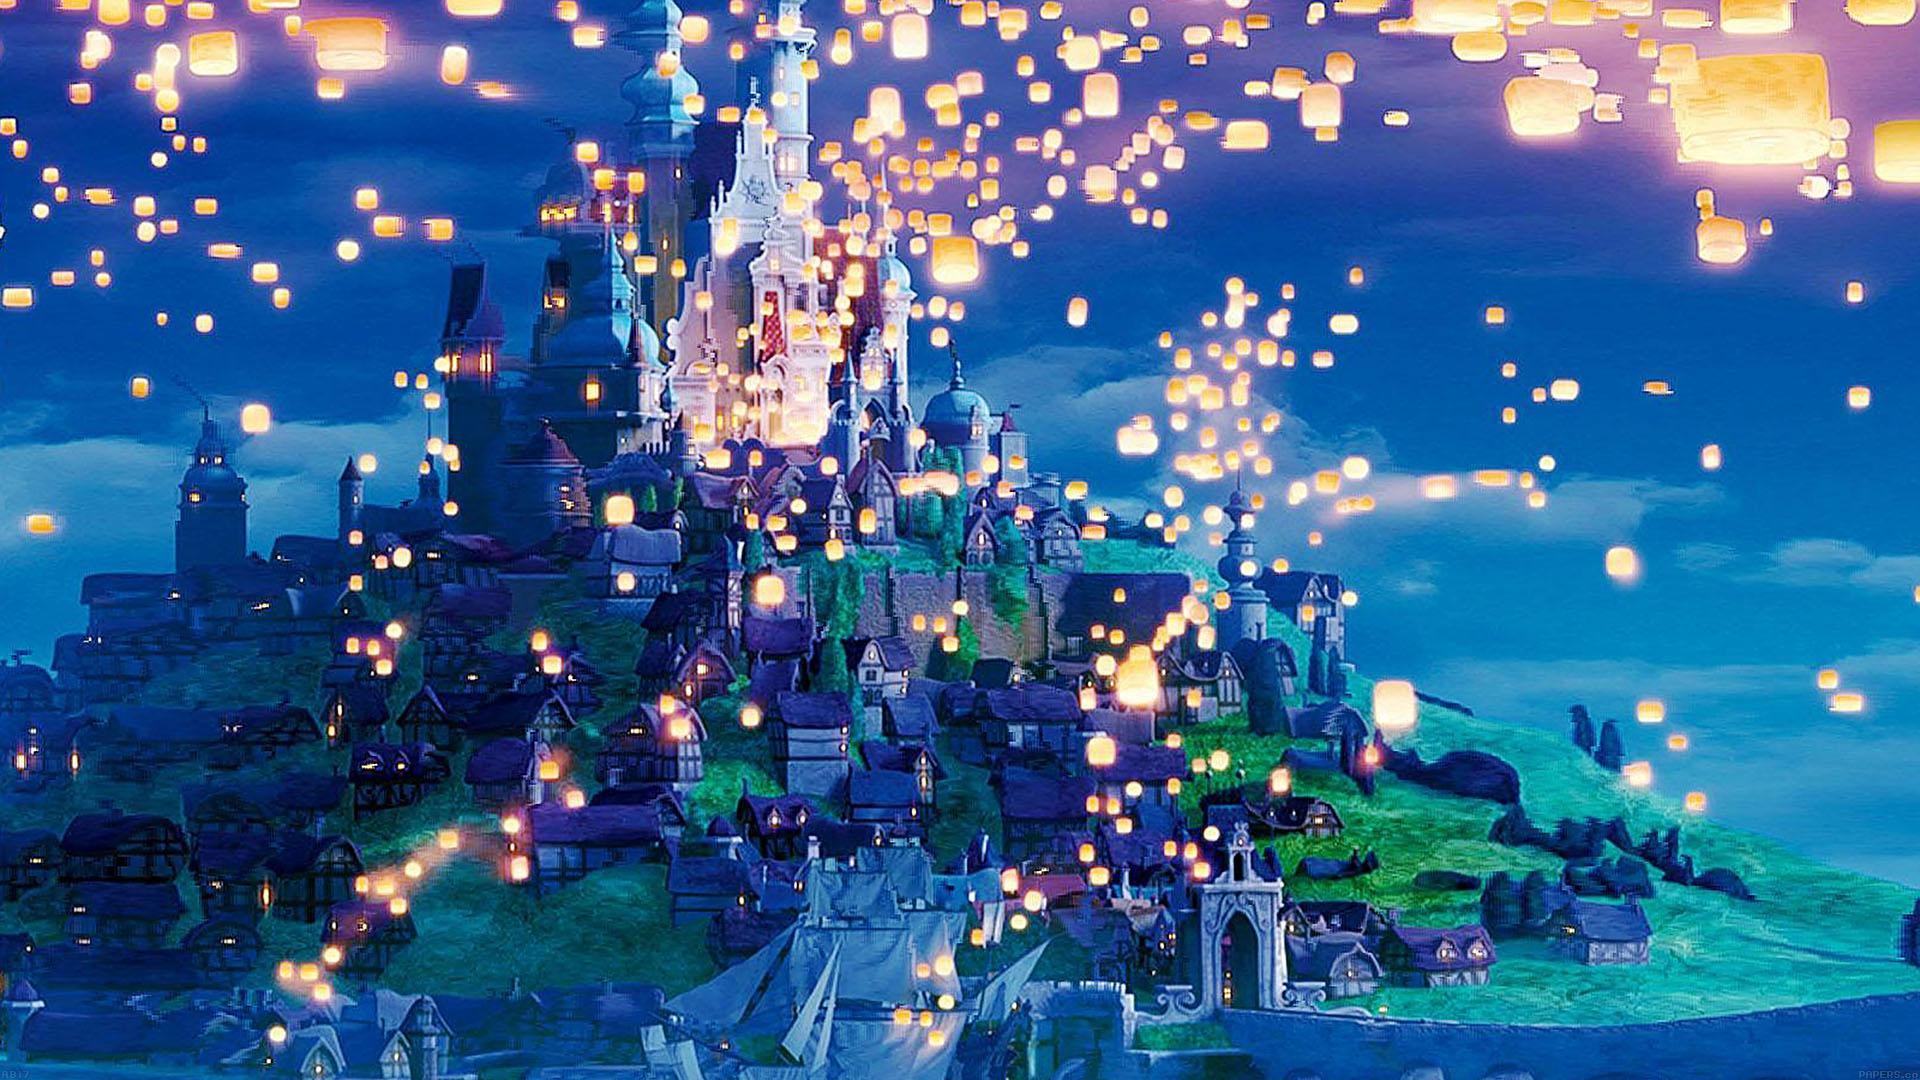 Car Desktop Wallpaper Hd 3d Full Screen Free Download Ab17 Wallpaper Rapunzel Dreams Disney Illust Papers Co